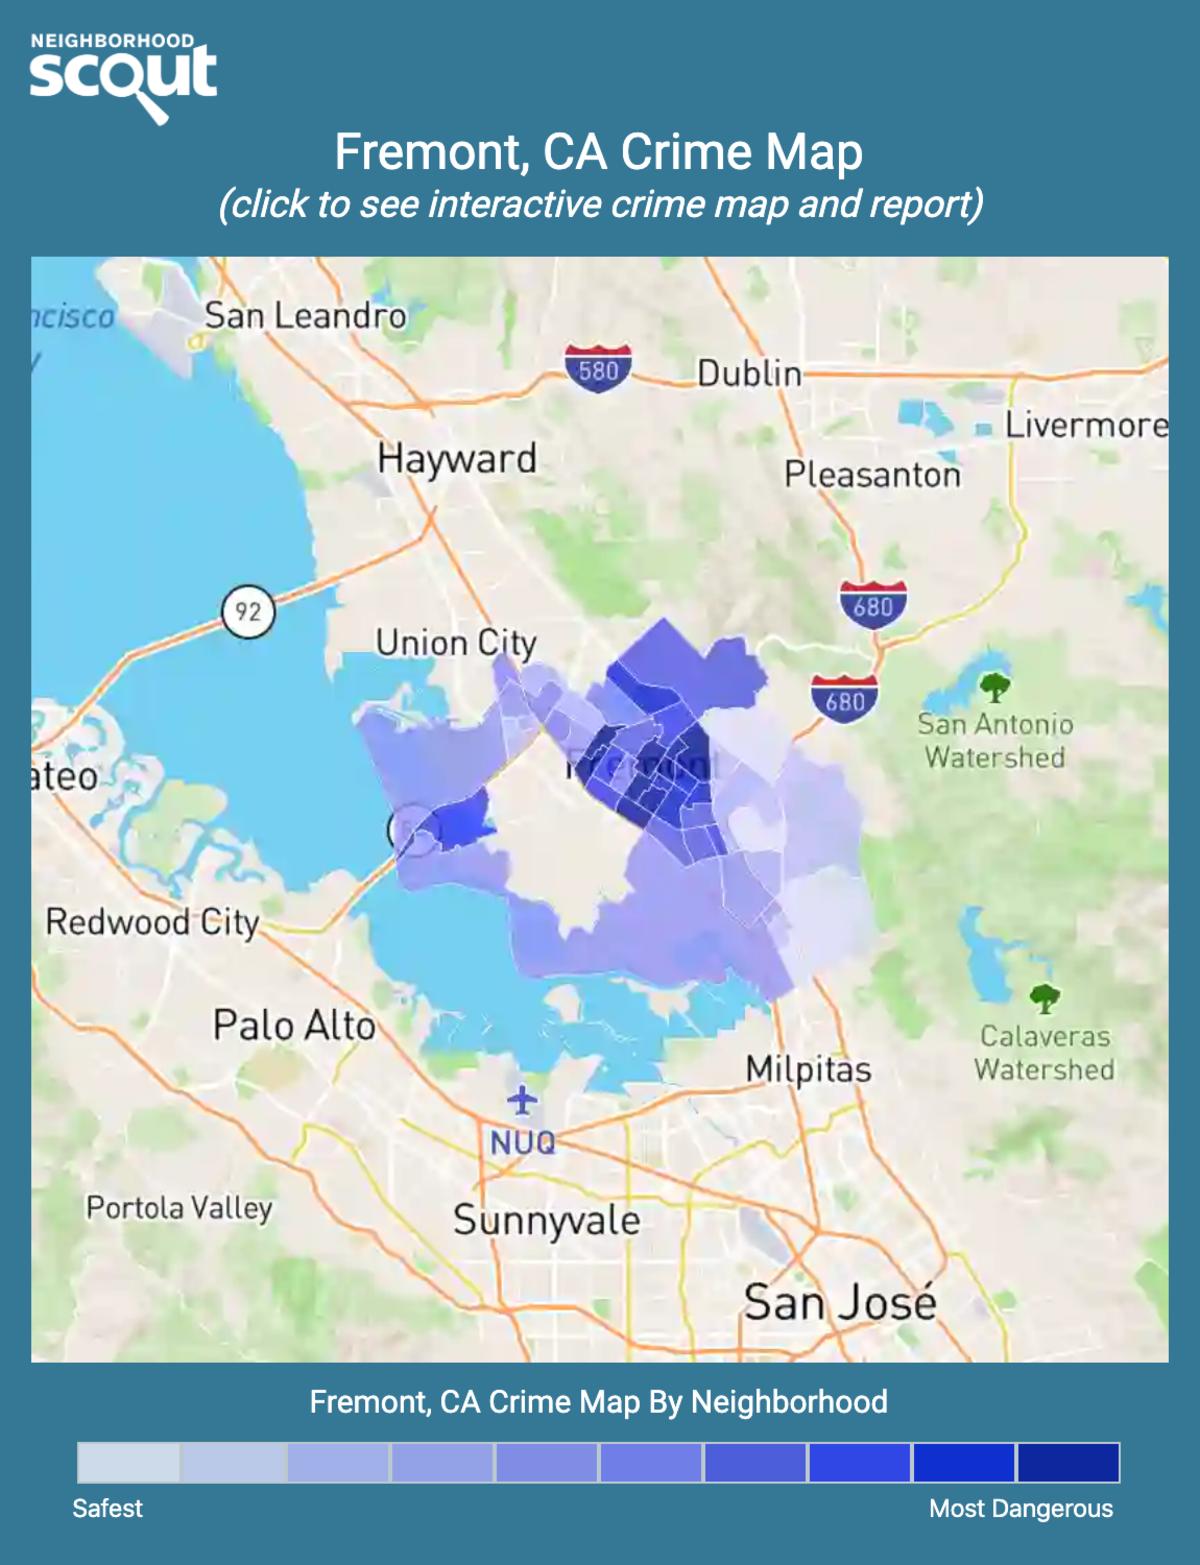 Fremont, California crime map